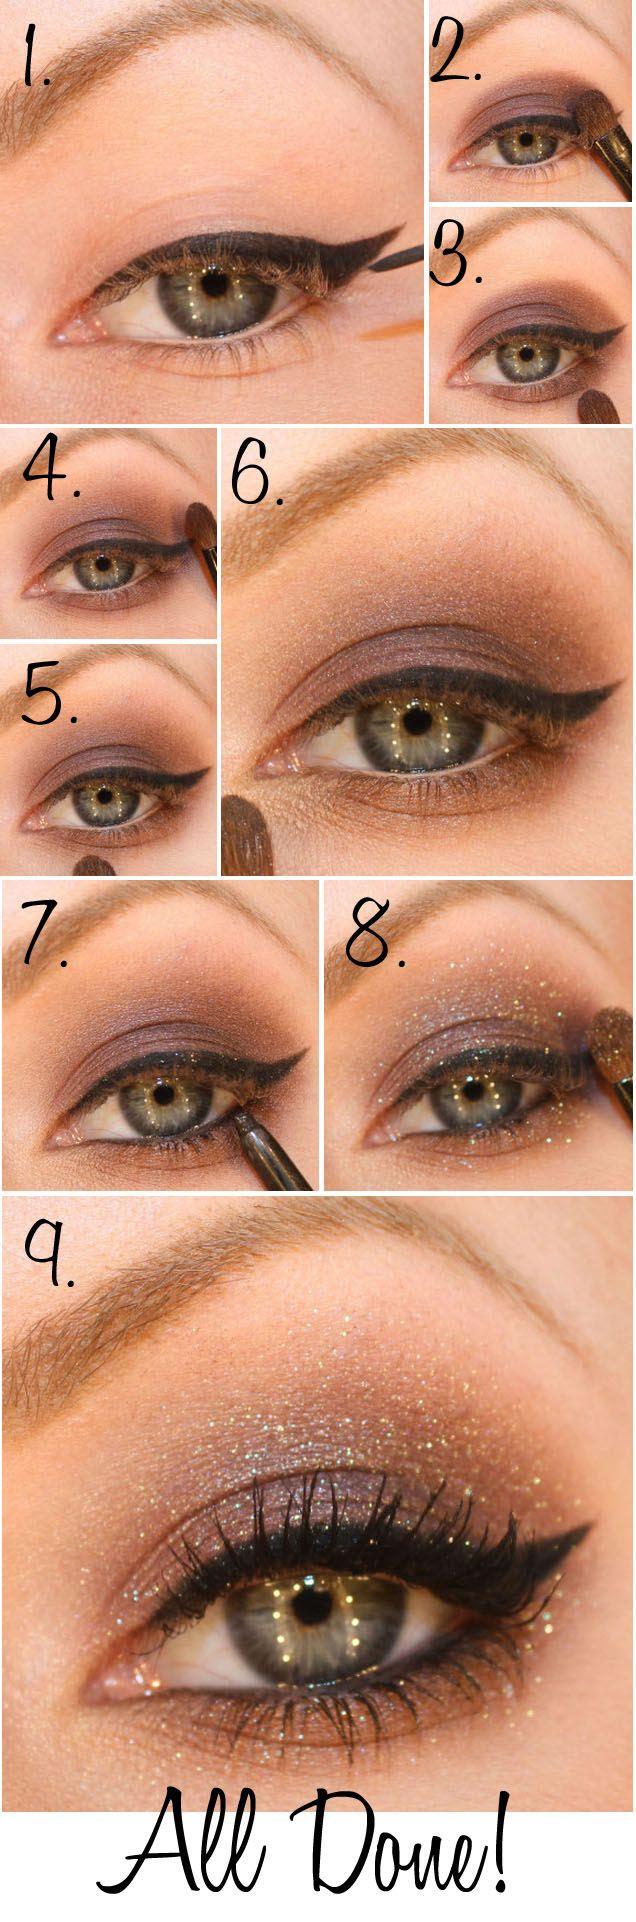 Amanda Seyfried Makeup Tutorial. So pretty!